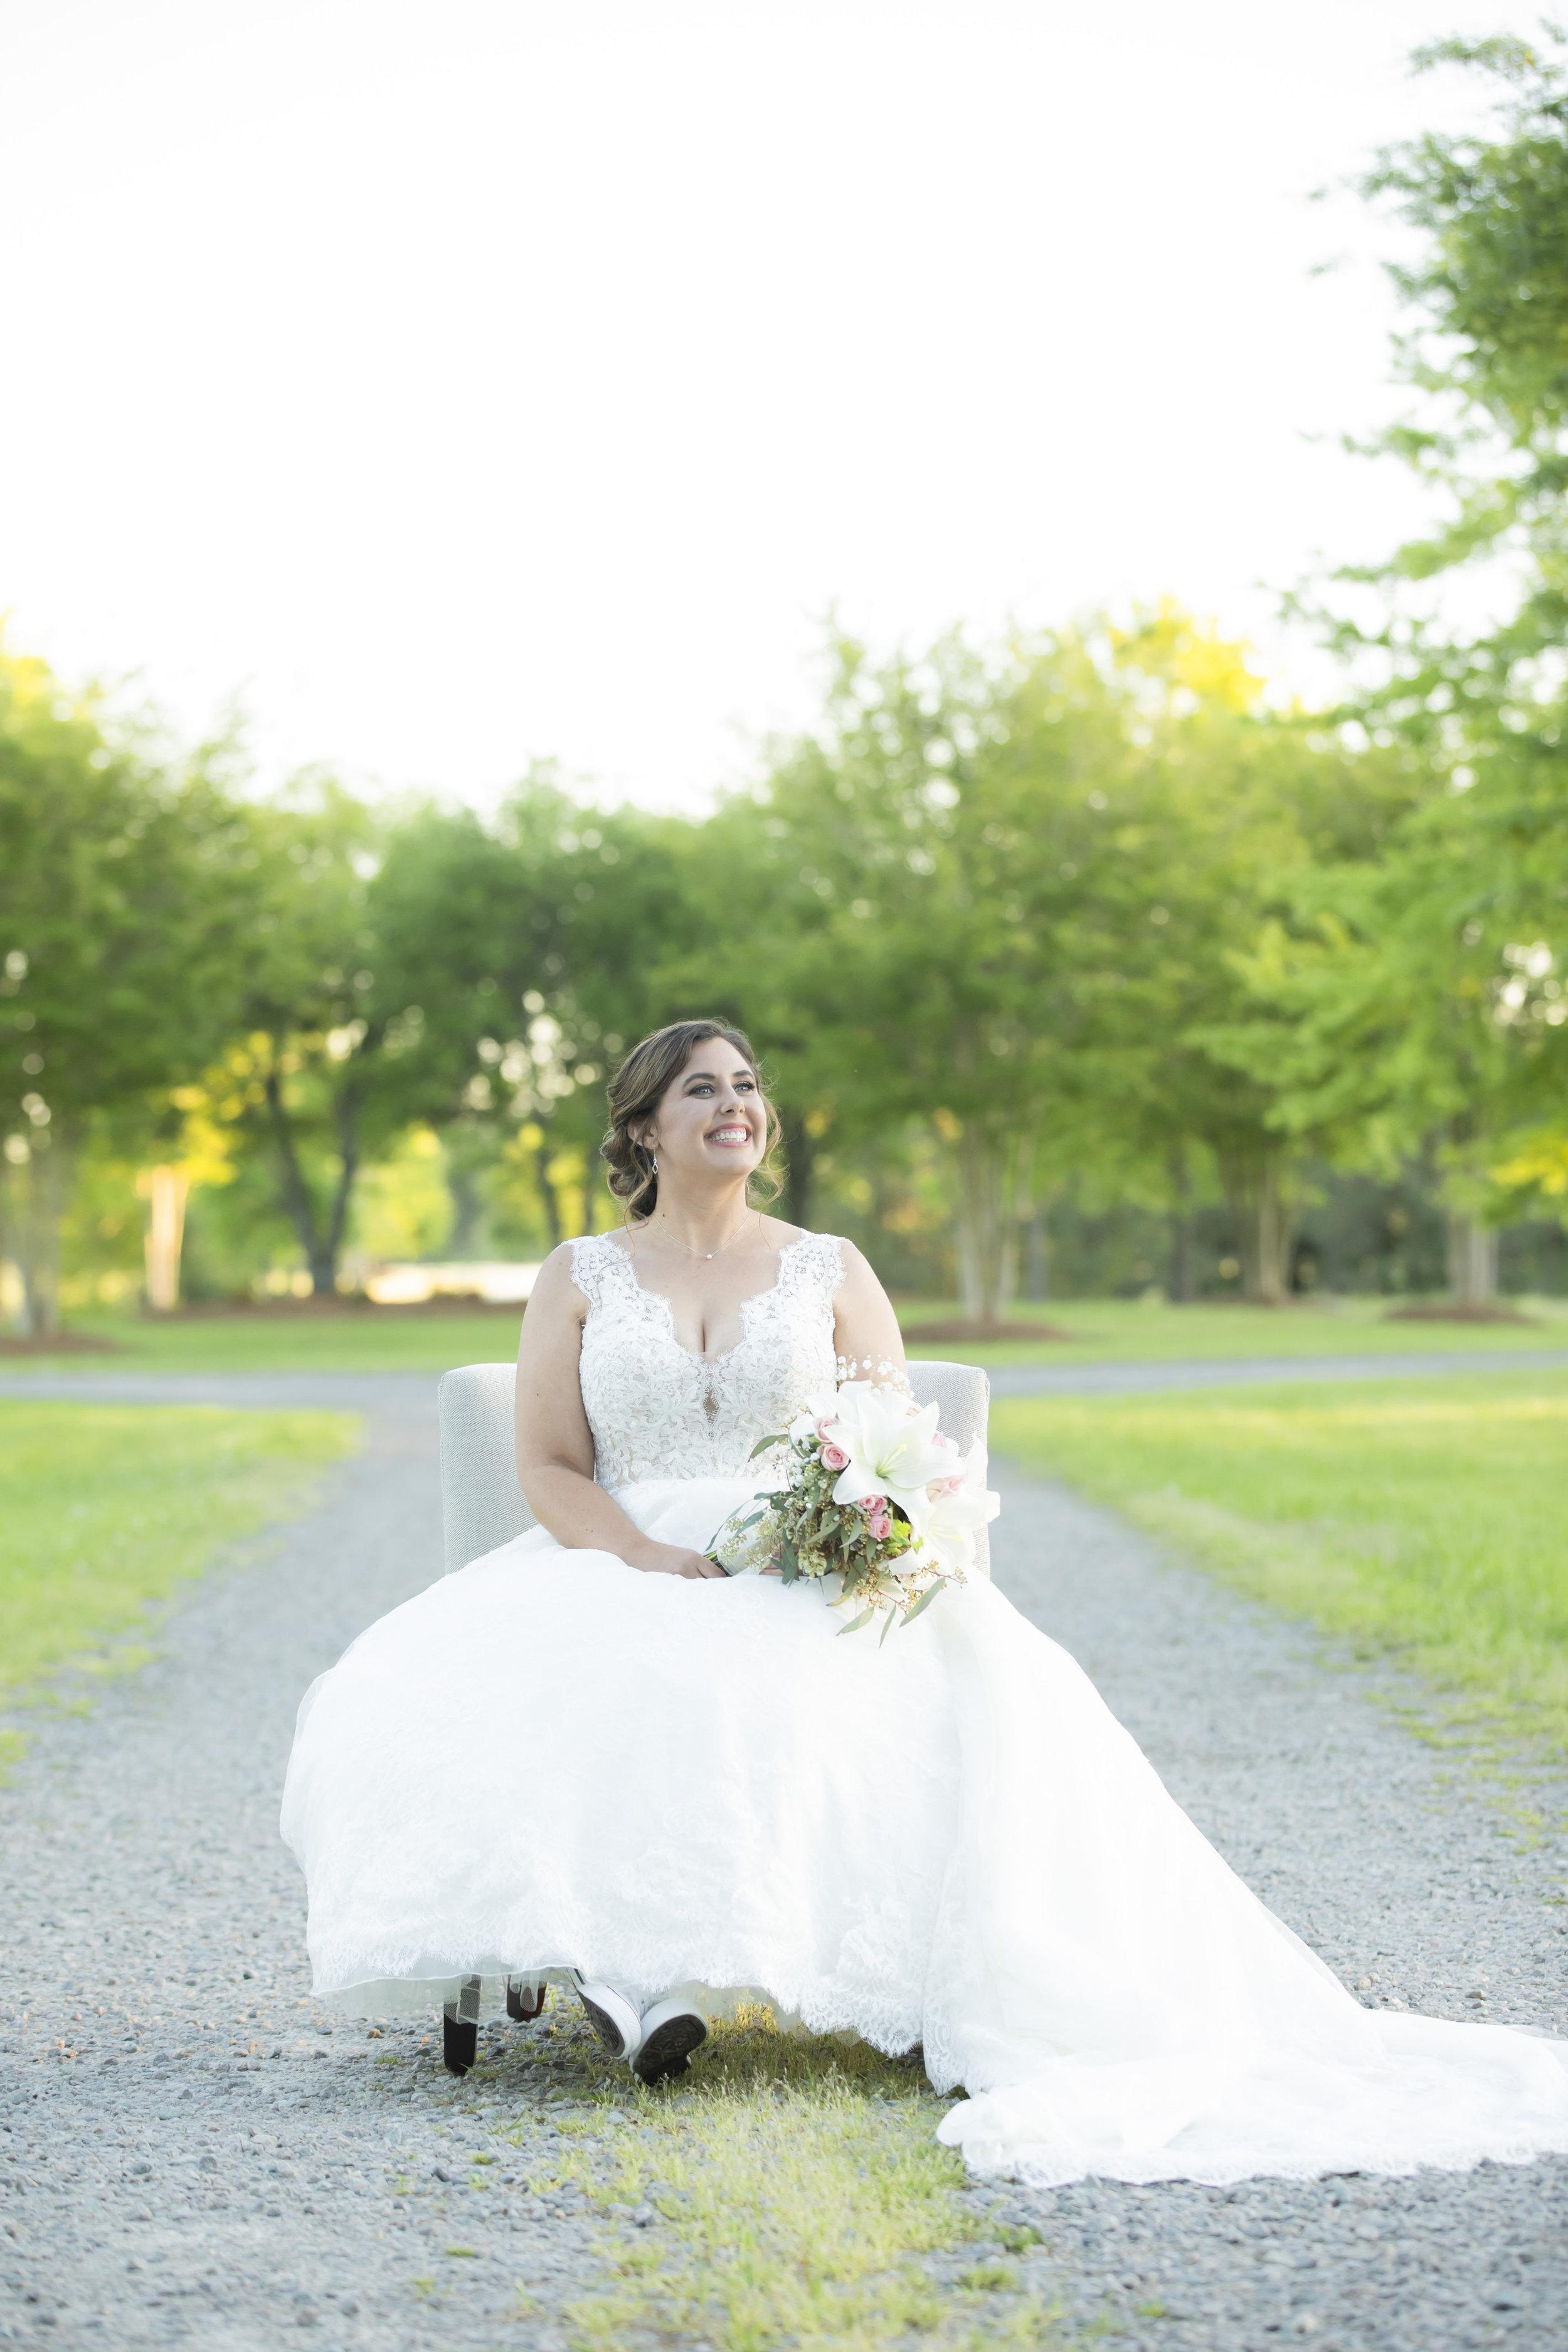 Bridal-Bridal-0086.jpg